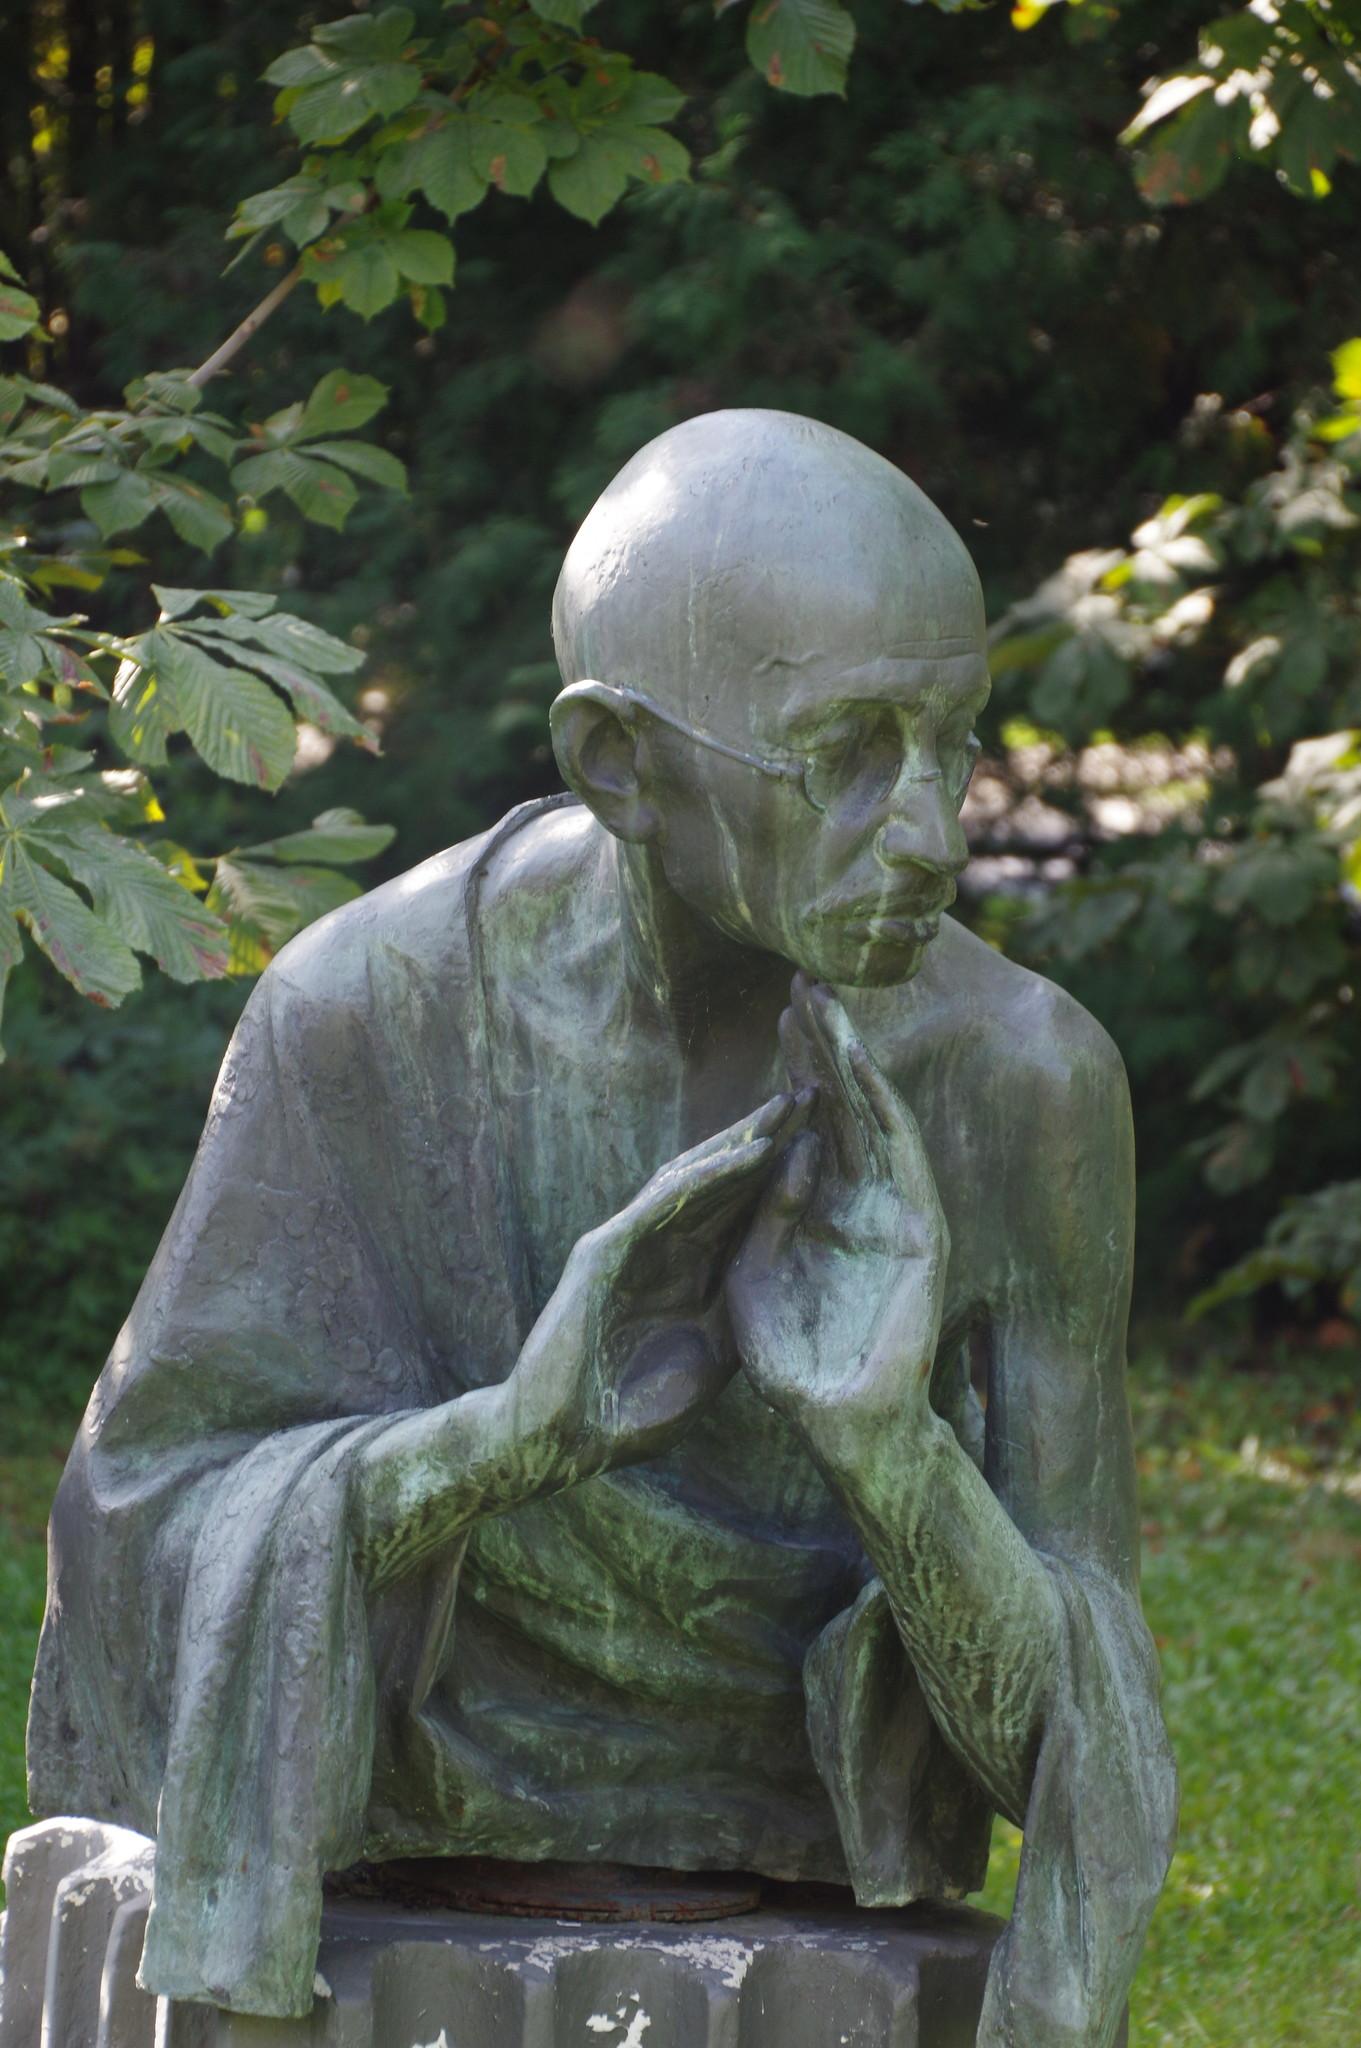 Махатма Ганди. Рябичев Д.Б. 1984 г. Бронза. Парк искусств «Музеон»